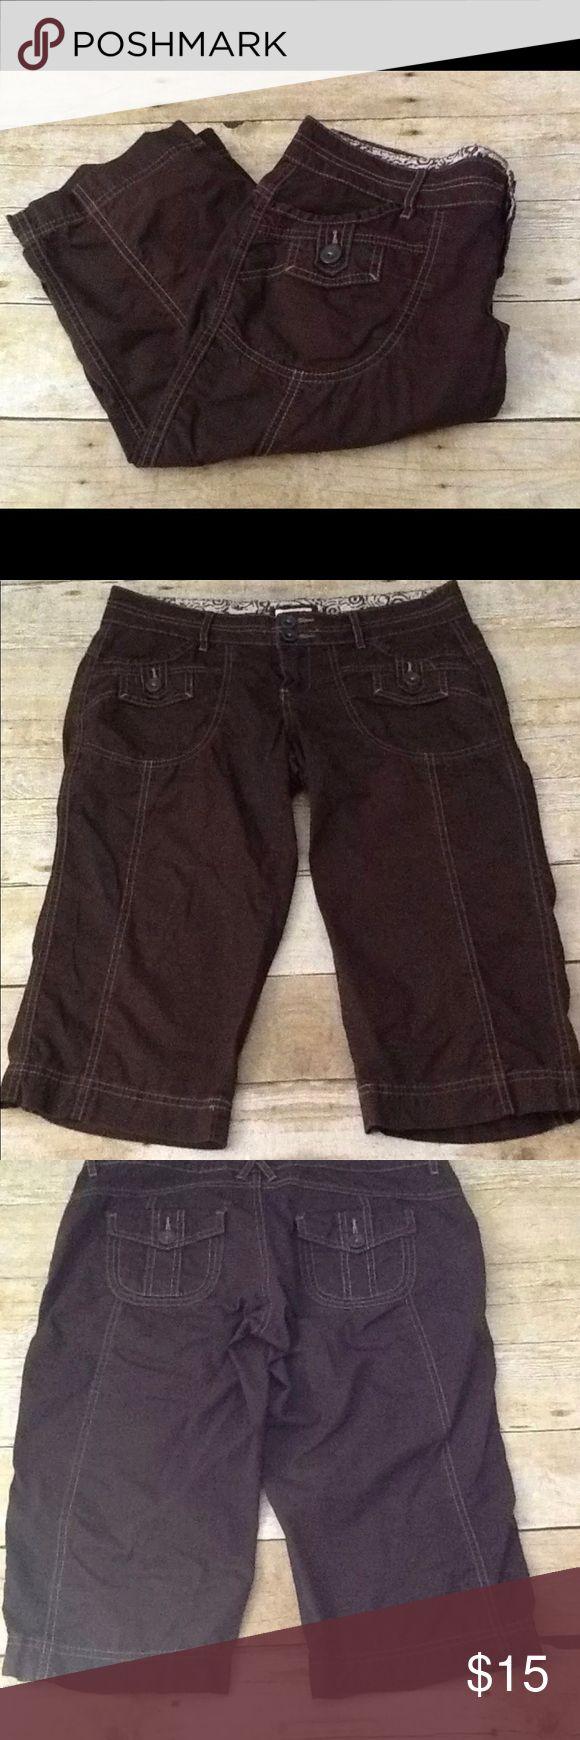 "Maurice's Brown Bermuda Capri Shorts Maurice's Brown Bermuda Capri Shorts. Women's Size 5/6. 100% Cotton. Waist 16"". Inseam 17"". Maurices Shorts"